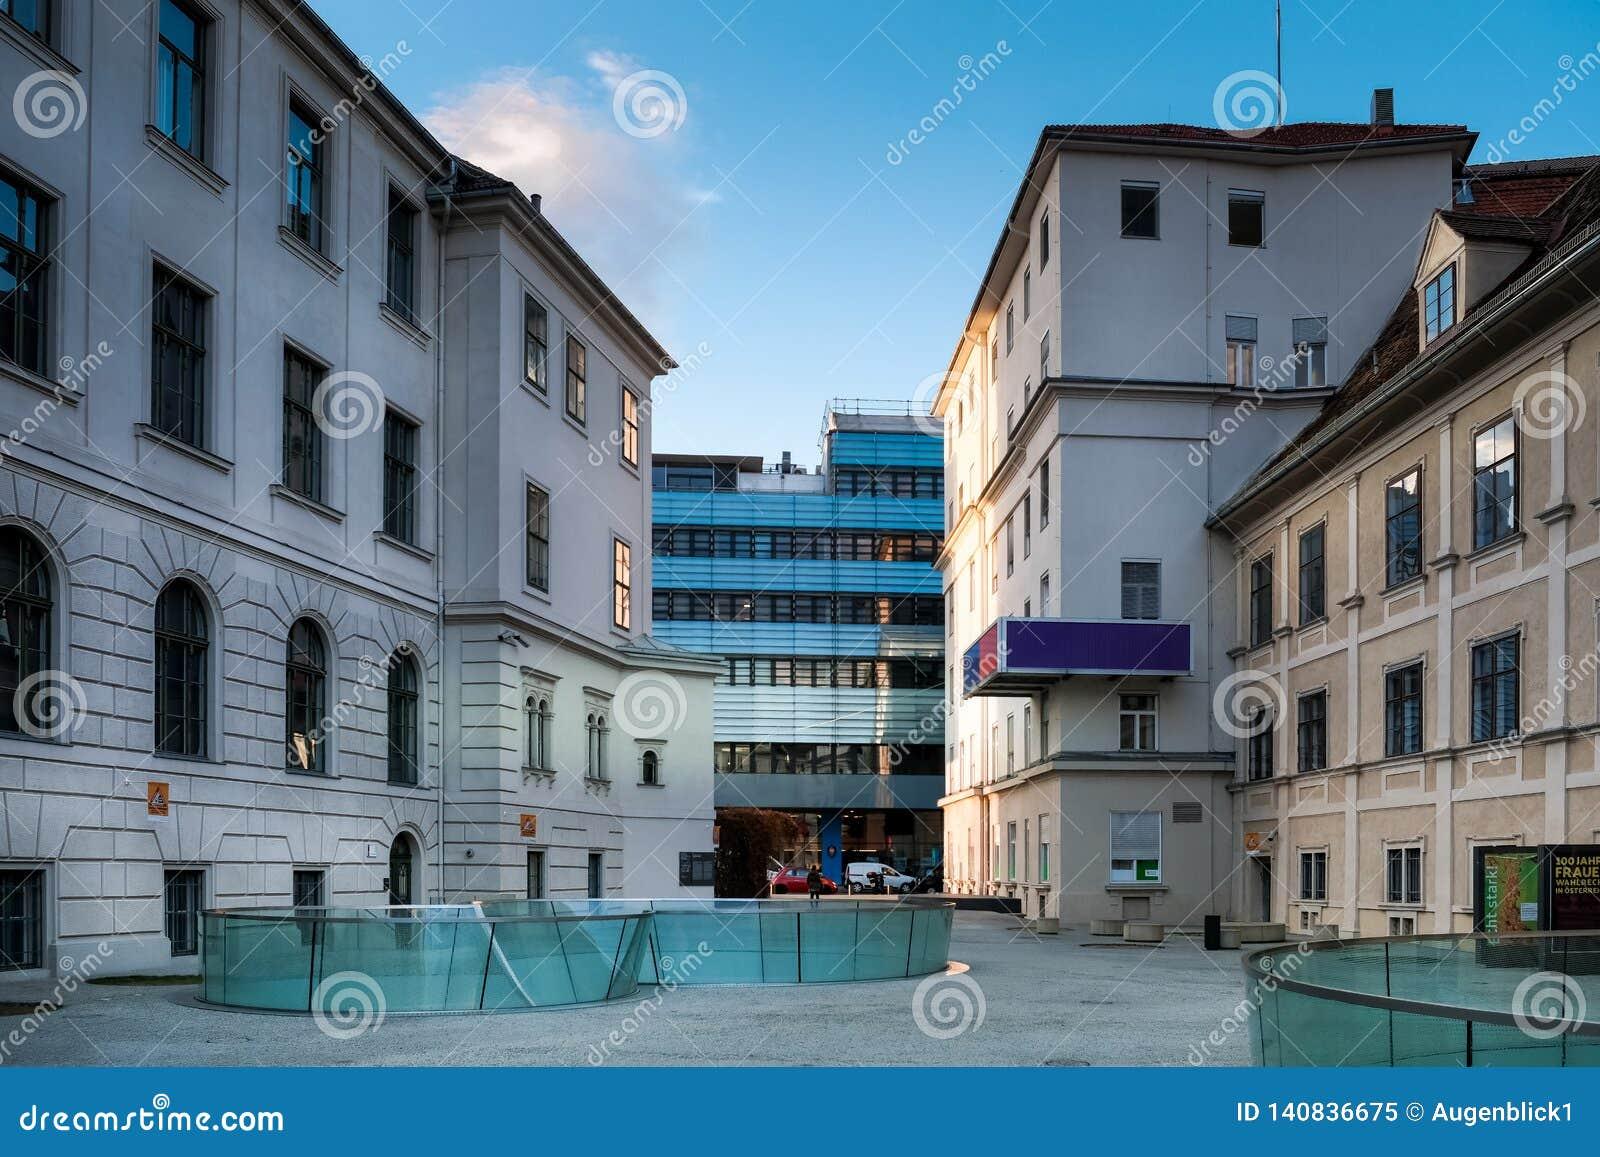 Das Universalmuseum Joanneum in Graz